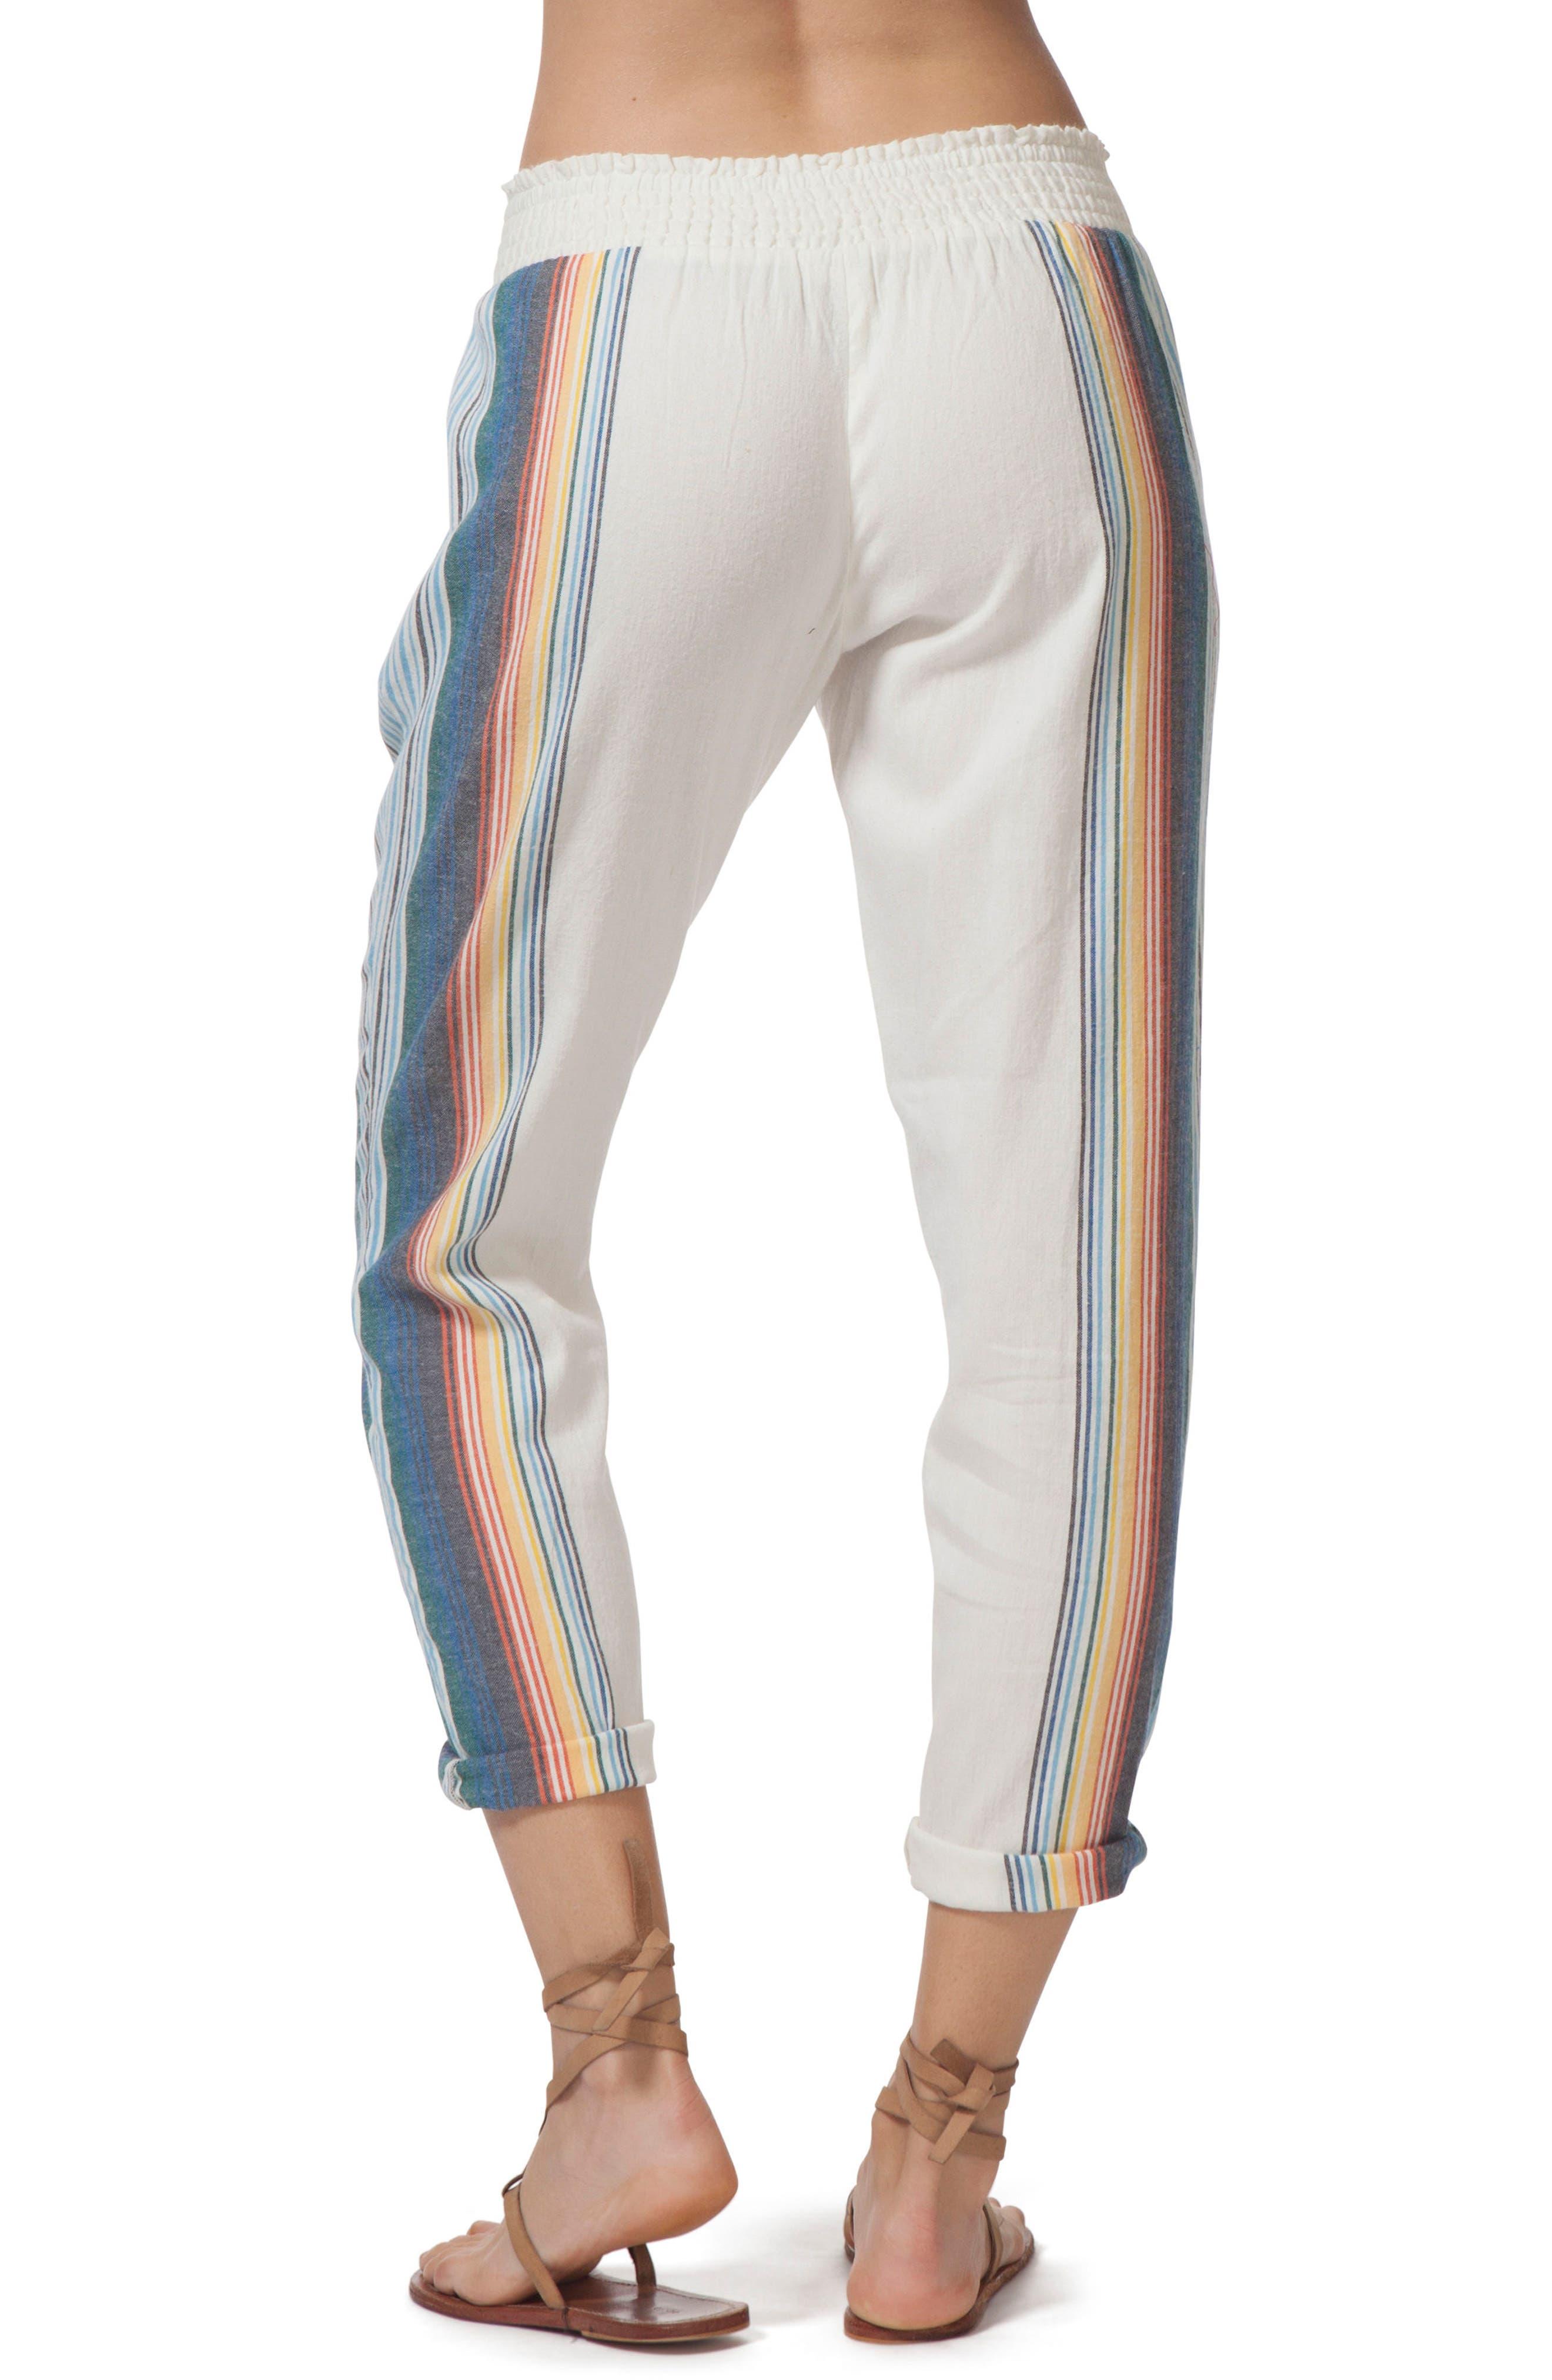 Beach Bazaar Pants,                             Alternate thumbnail 2, color,                             VANILLA